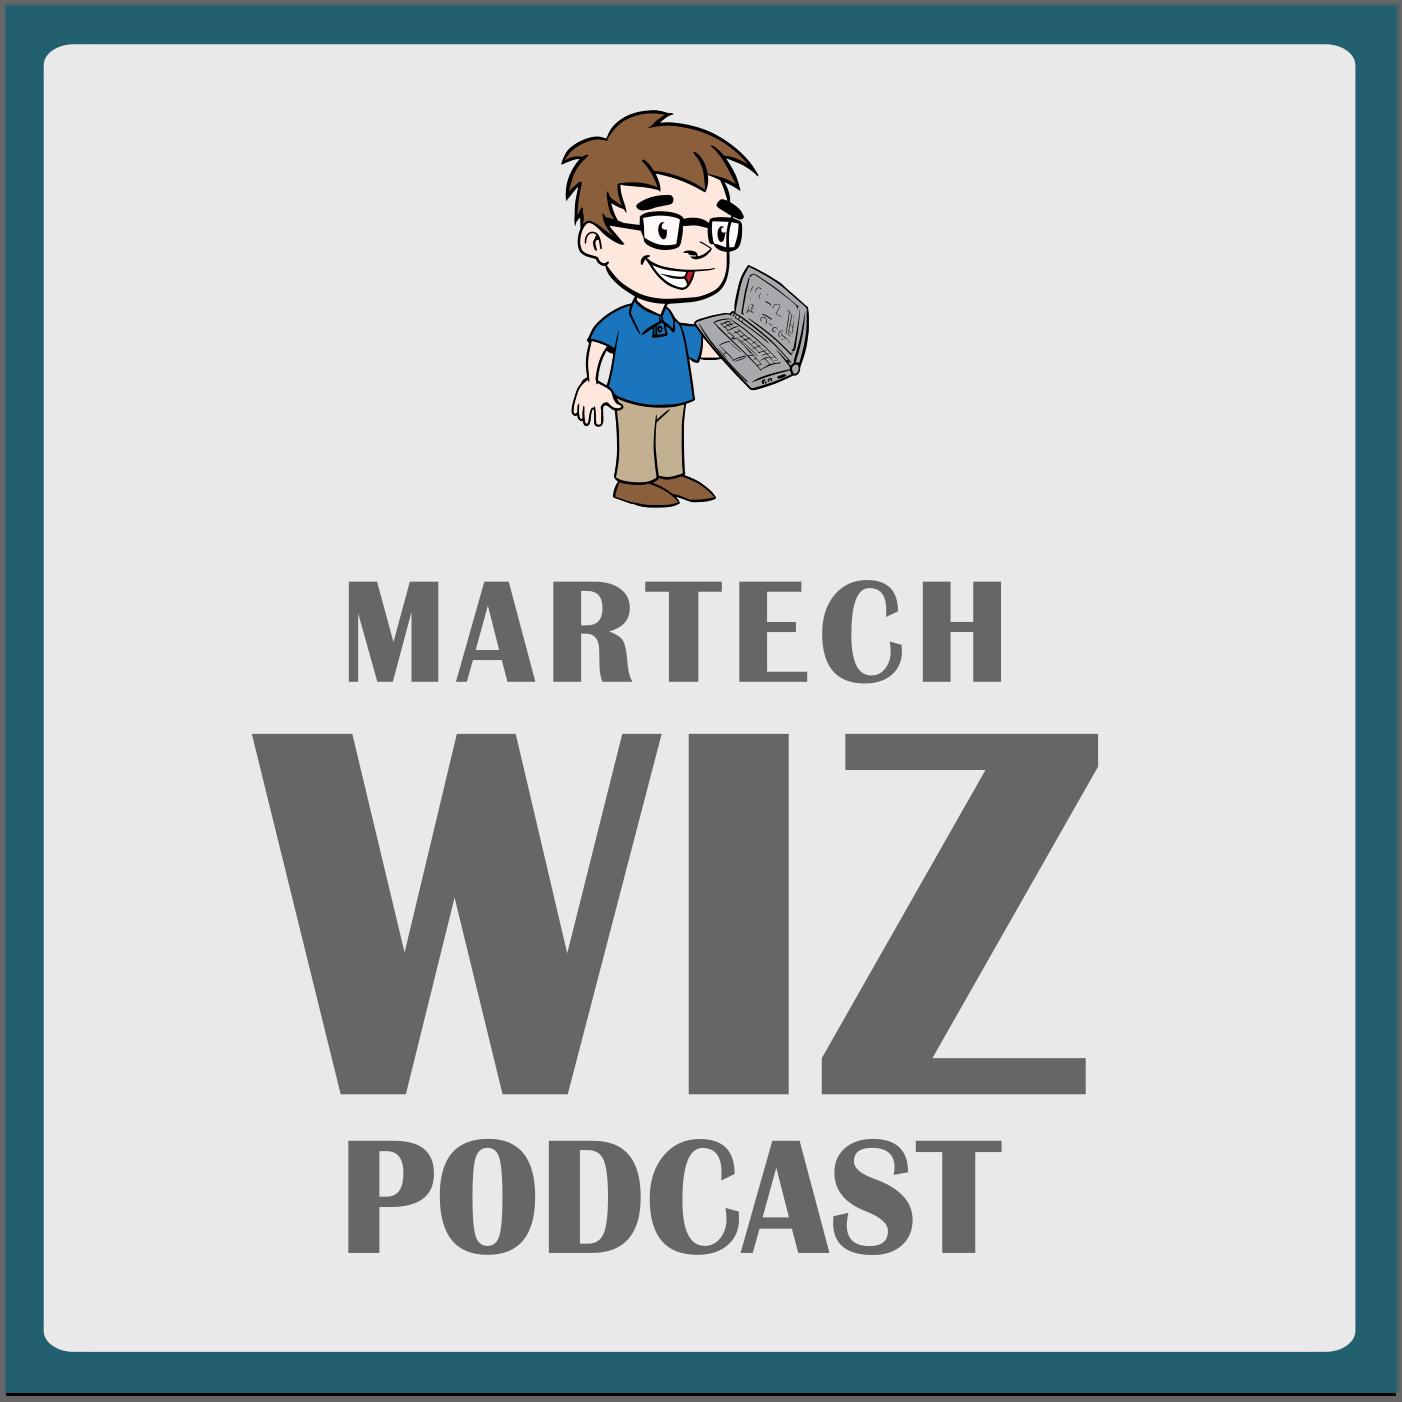 The MarTech Wiz Podcast